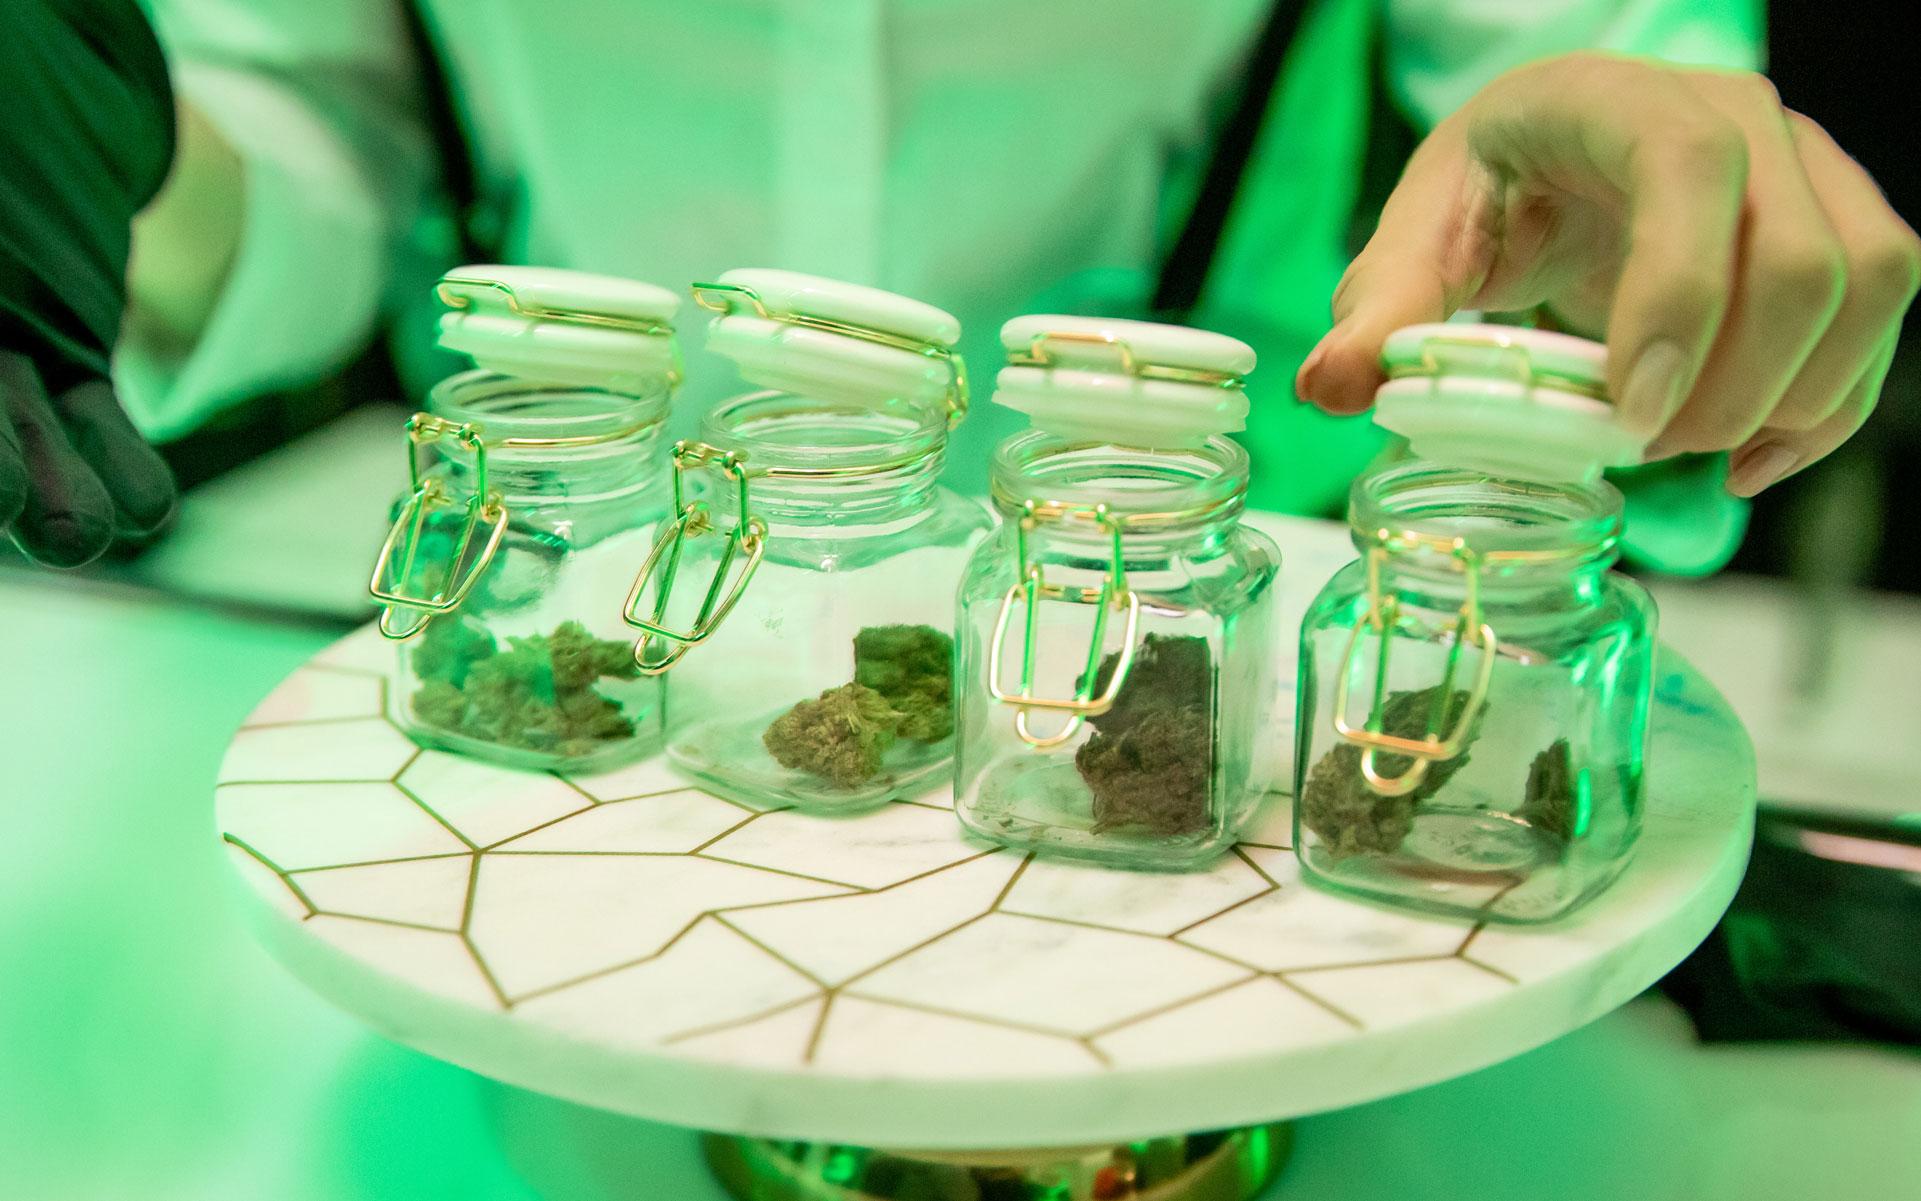 cannabis consumption space